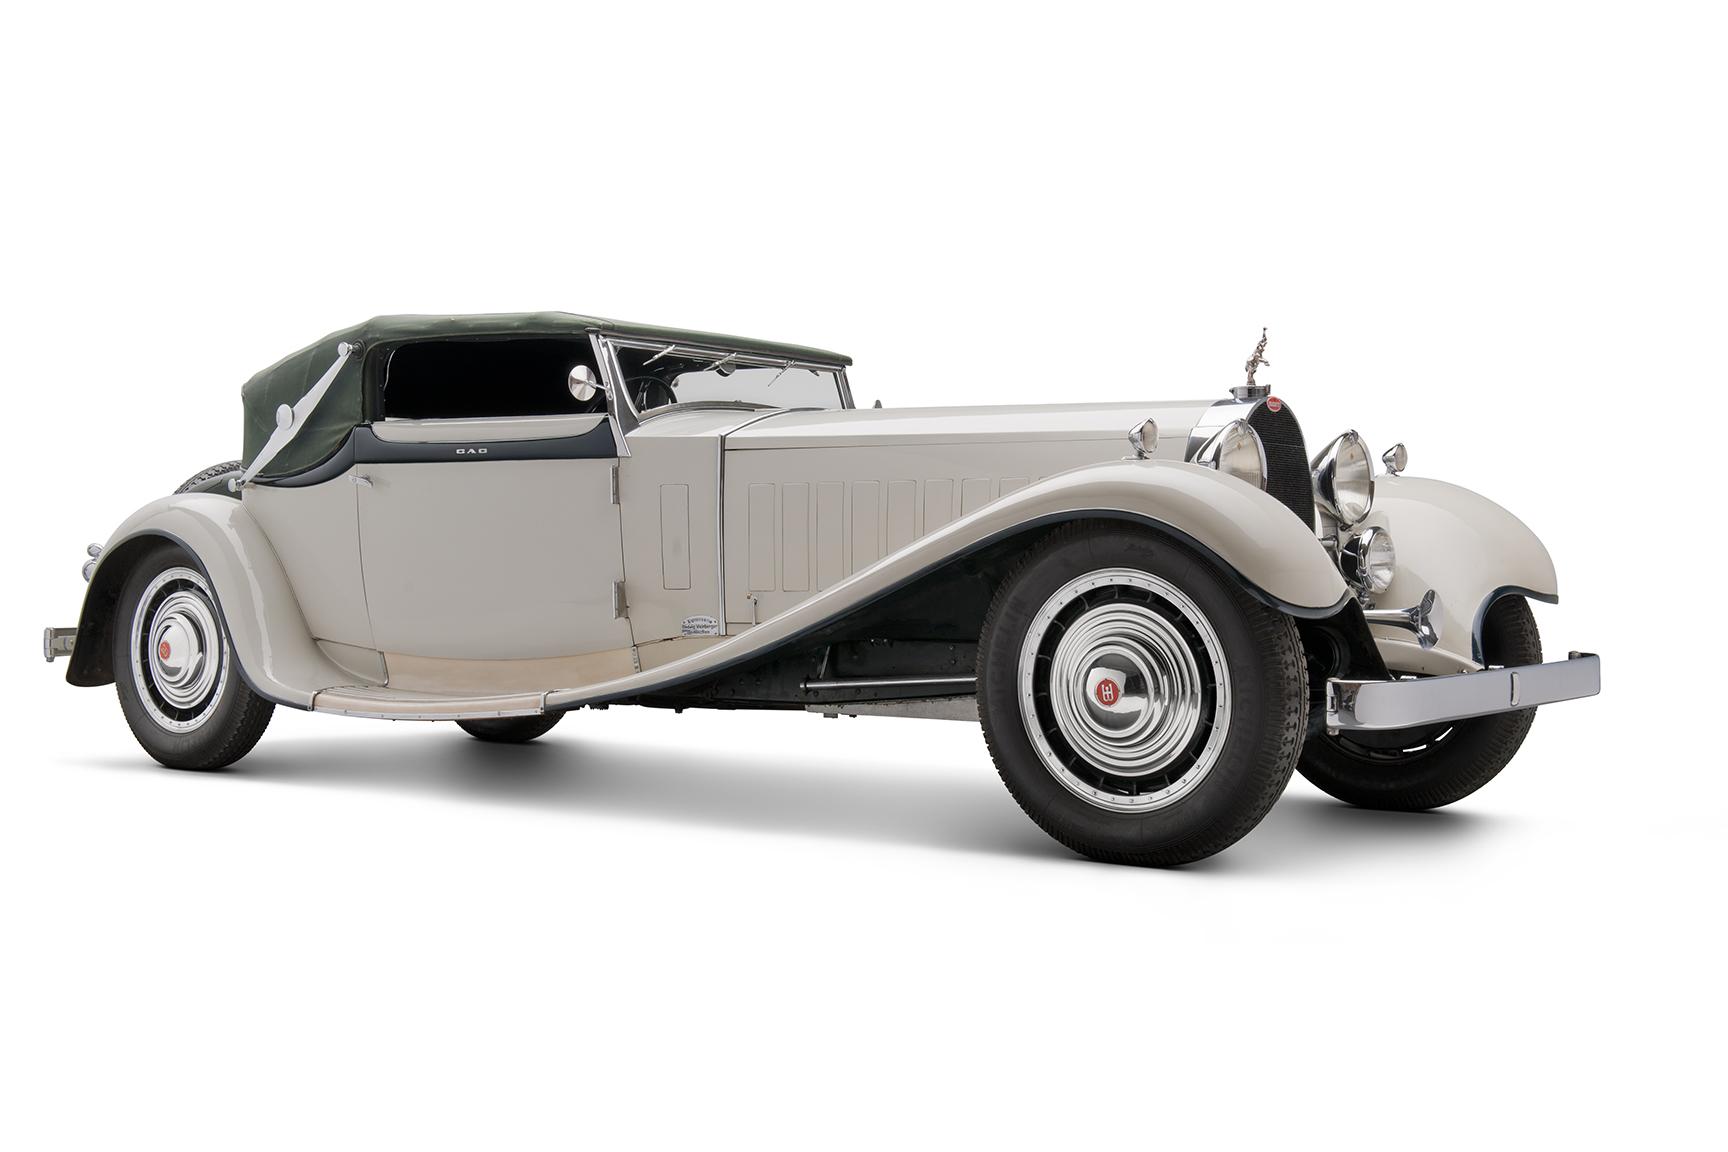 1931 Bugatti Type 41 Royale front 3/4